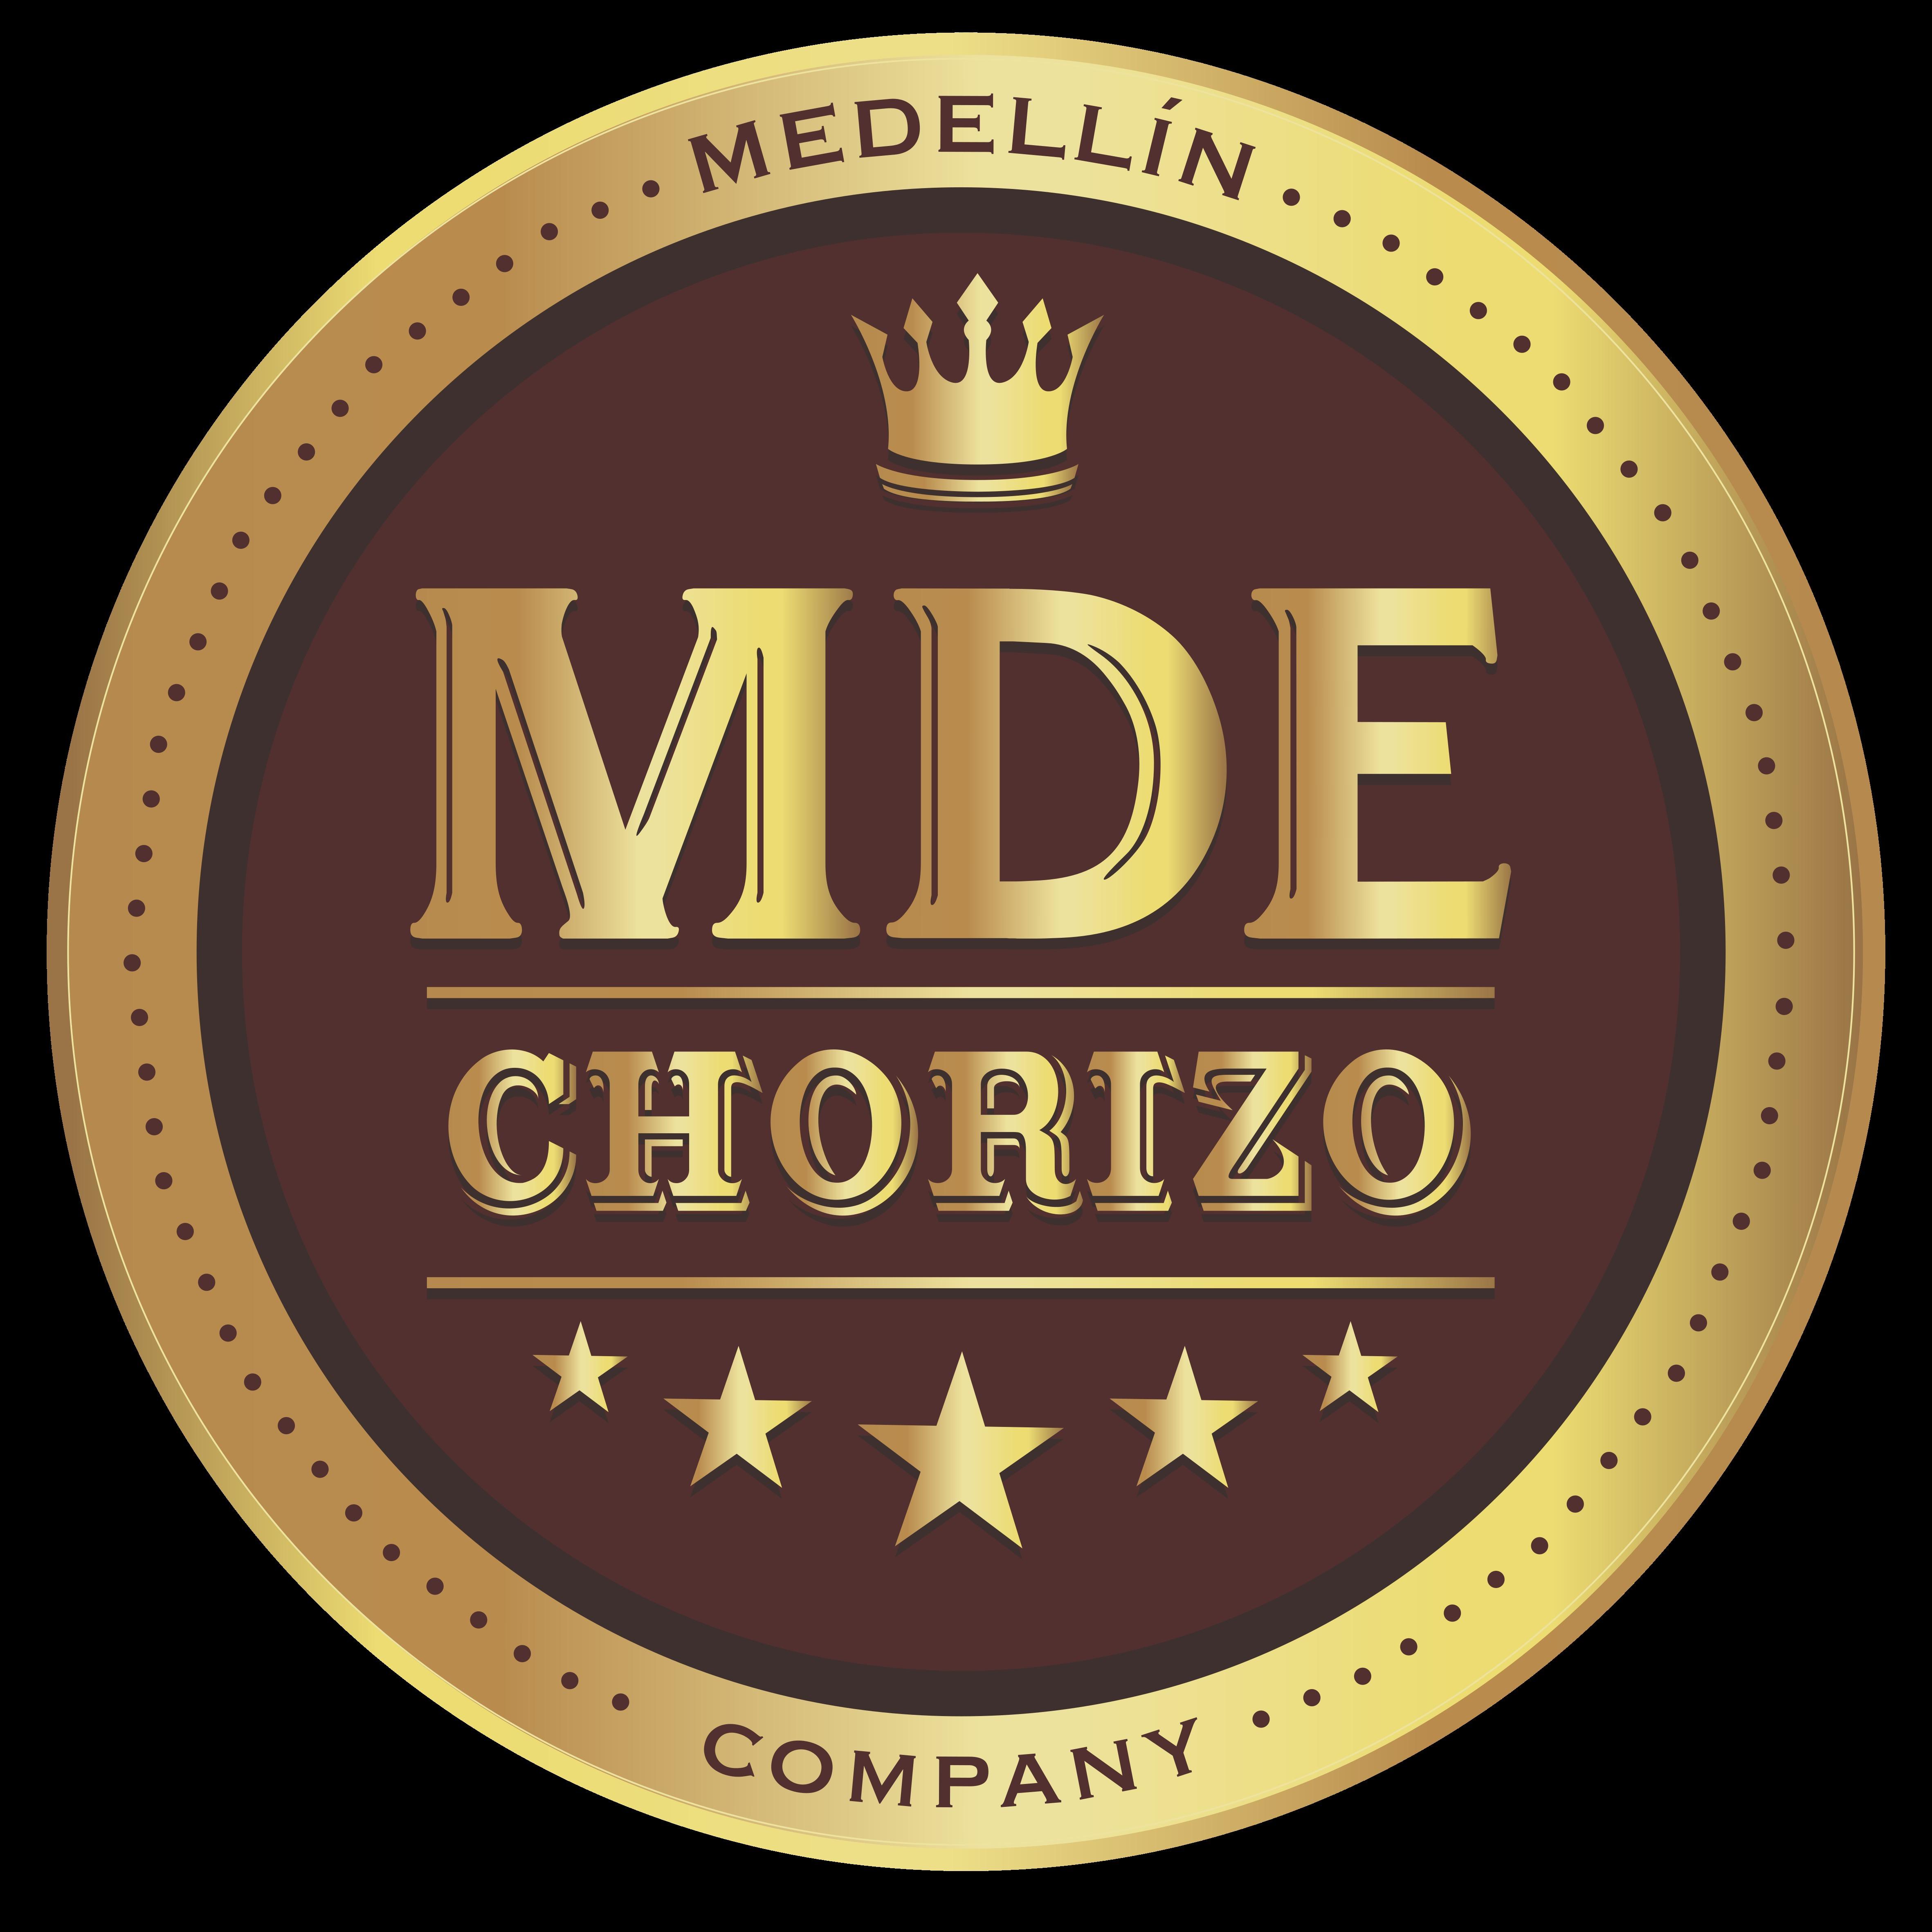 Medellín Chorizo Company Lleras